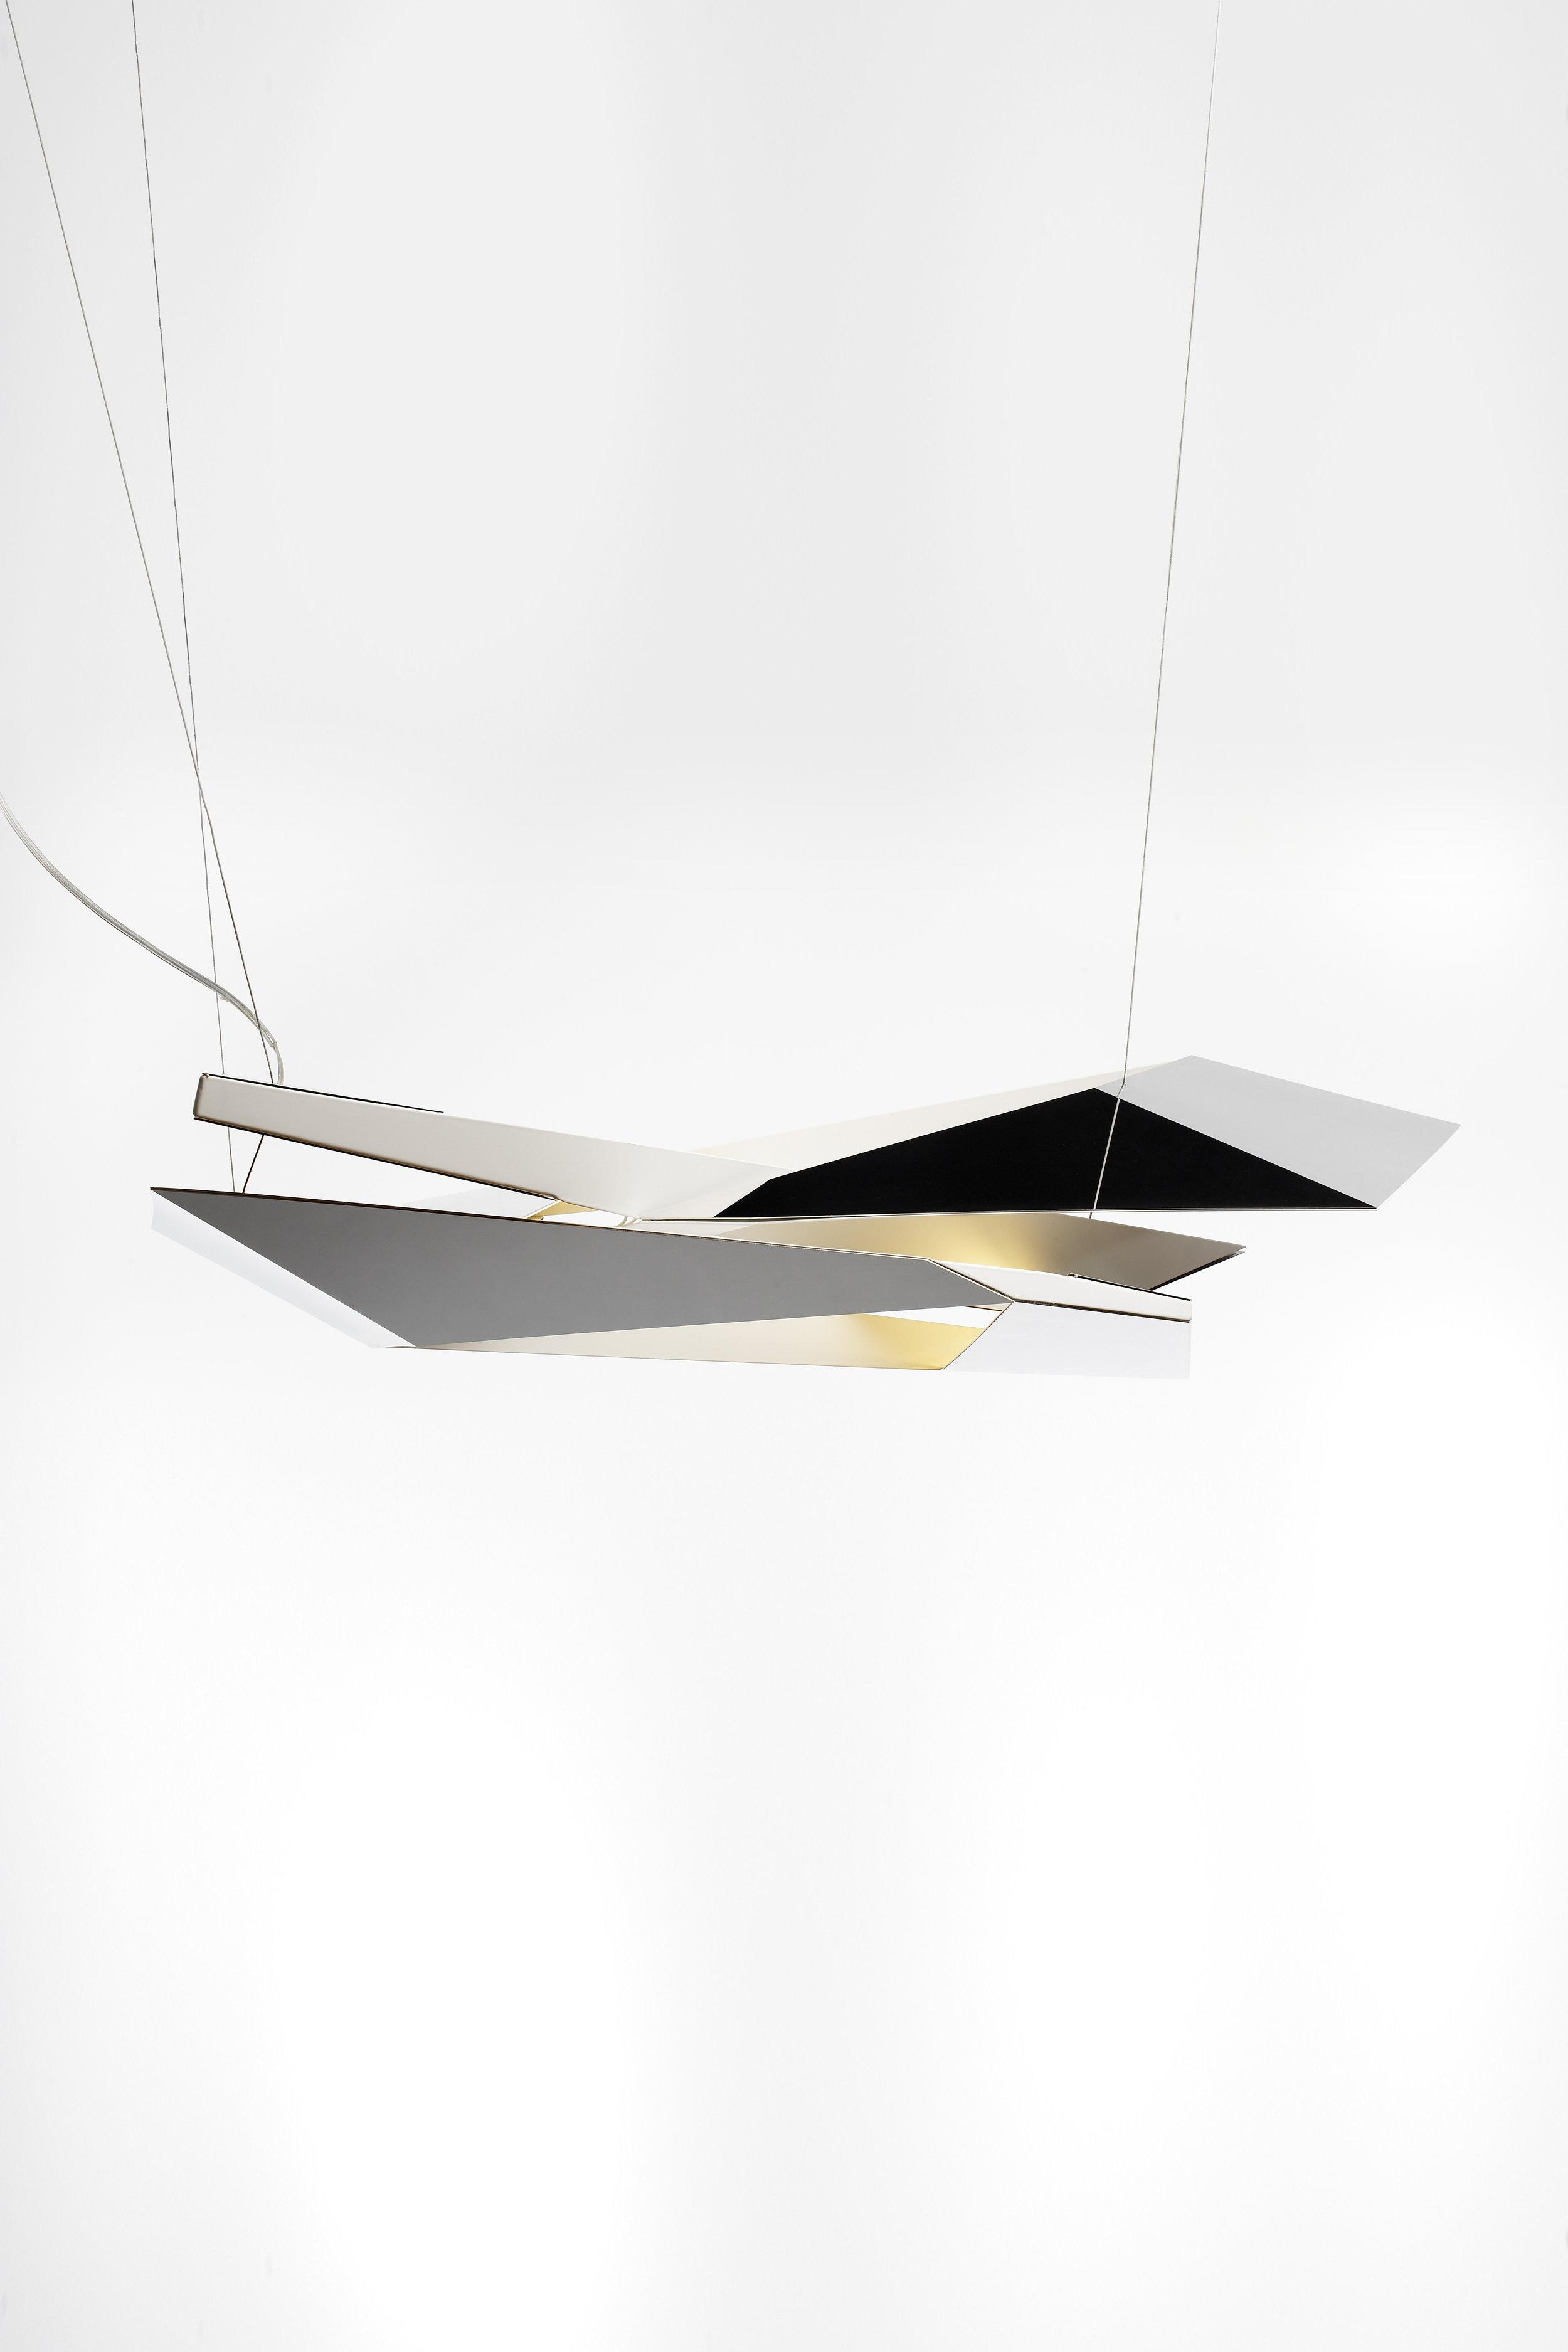 polygon-crash-light_lighting-design_coordination-berlin_00.jpg